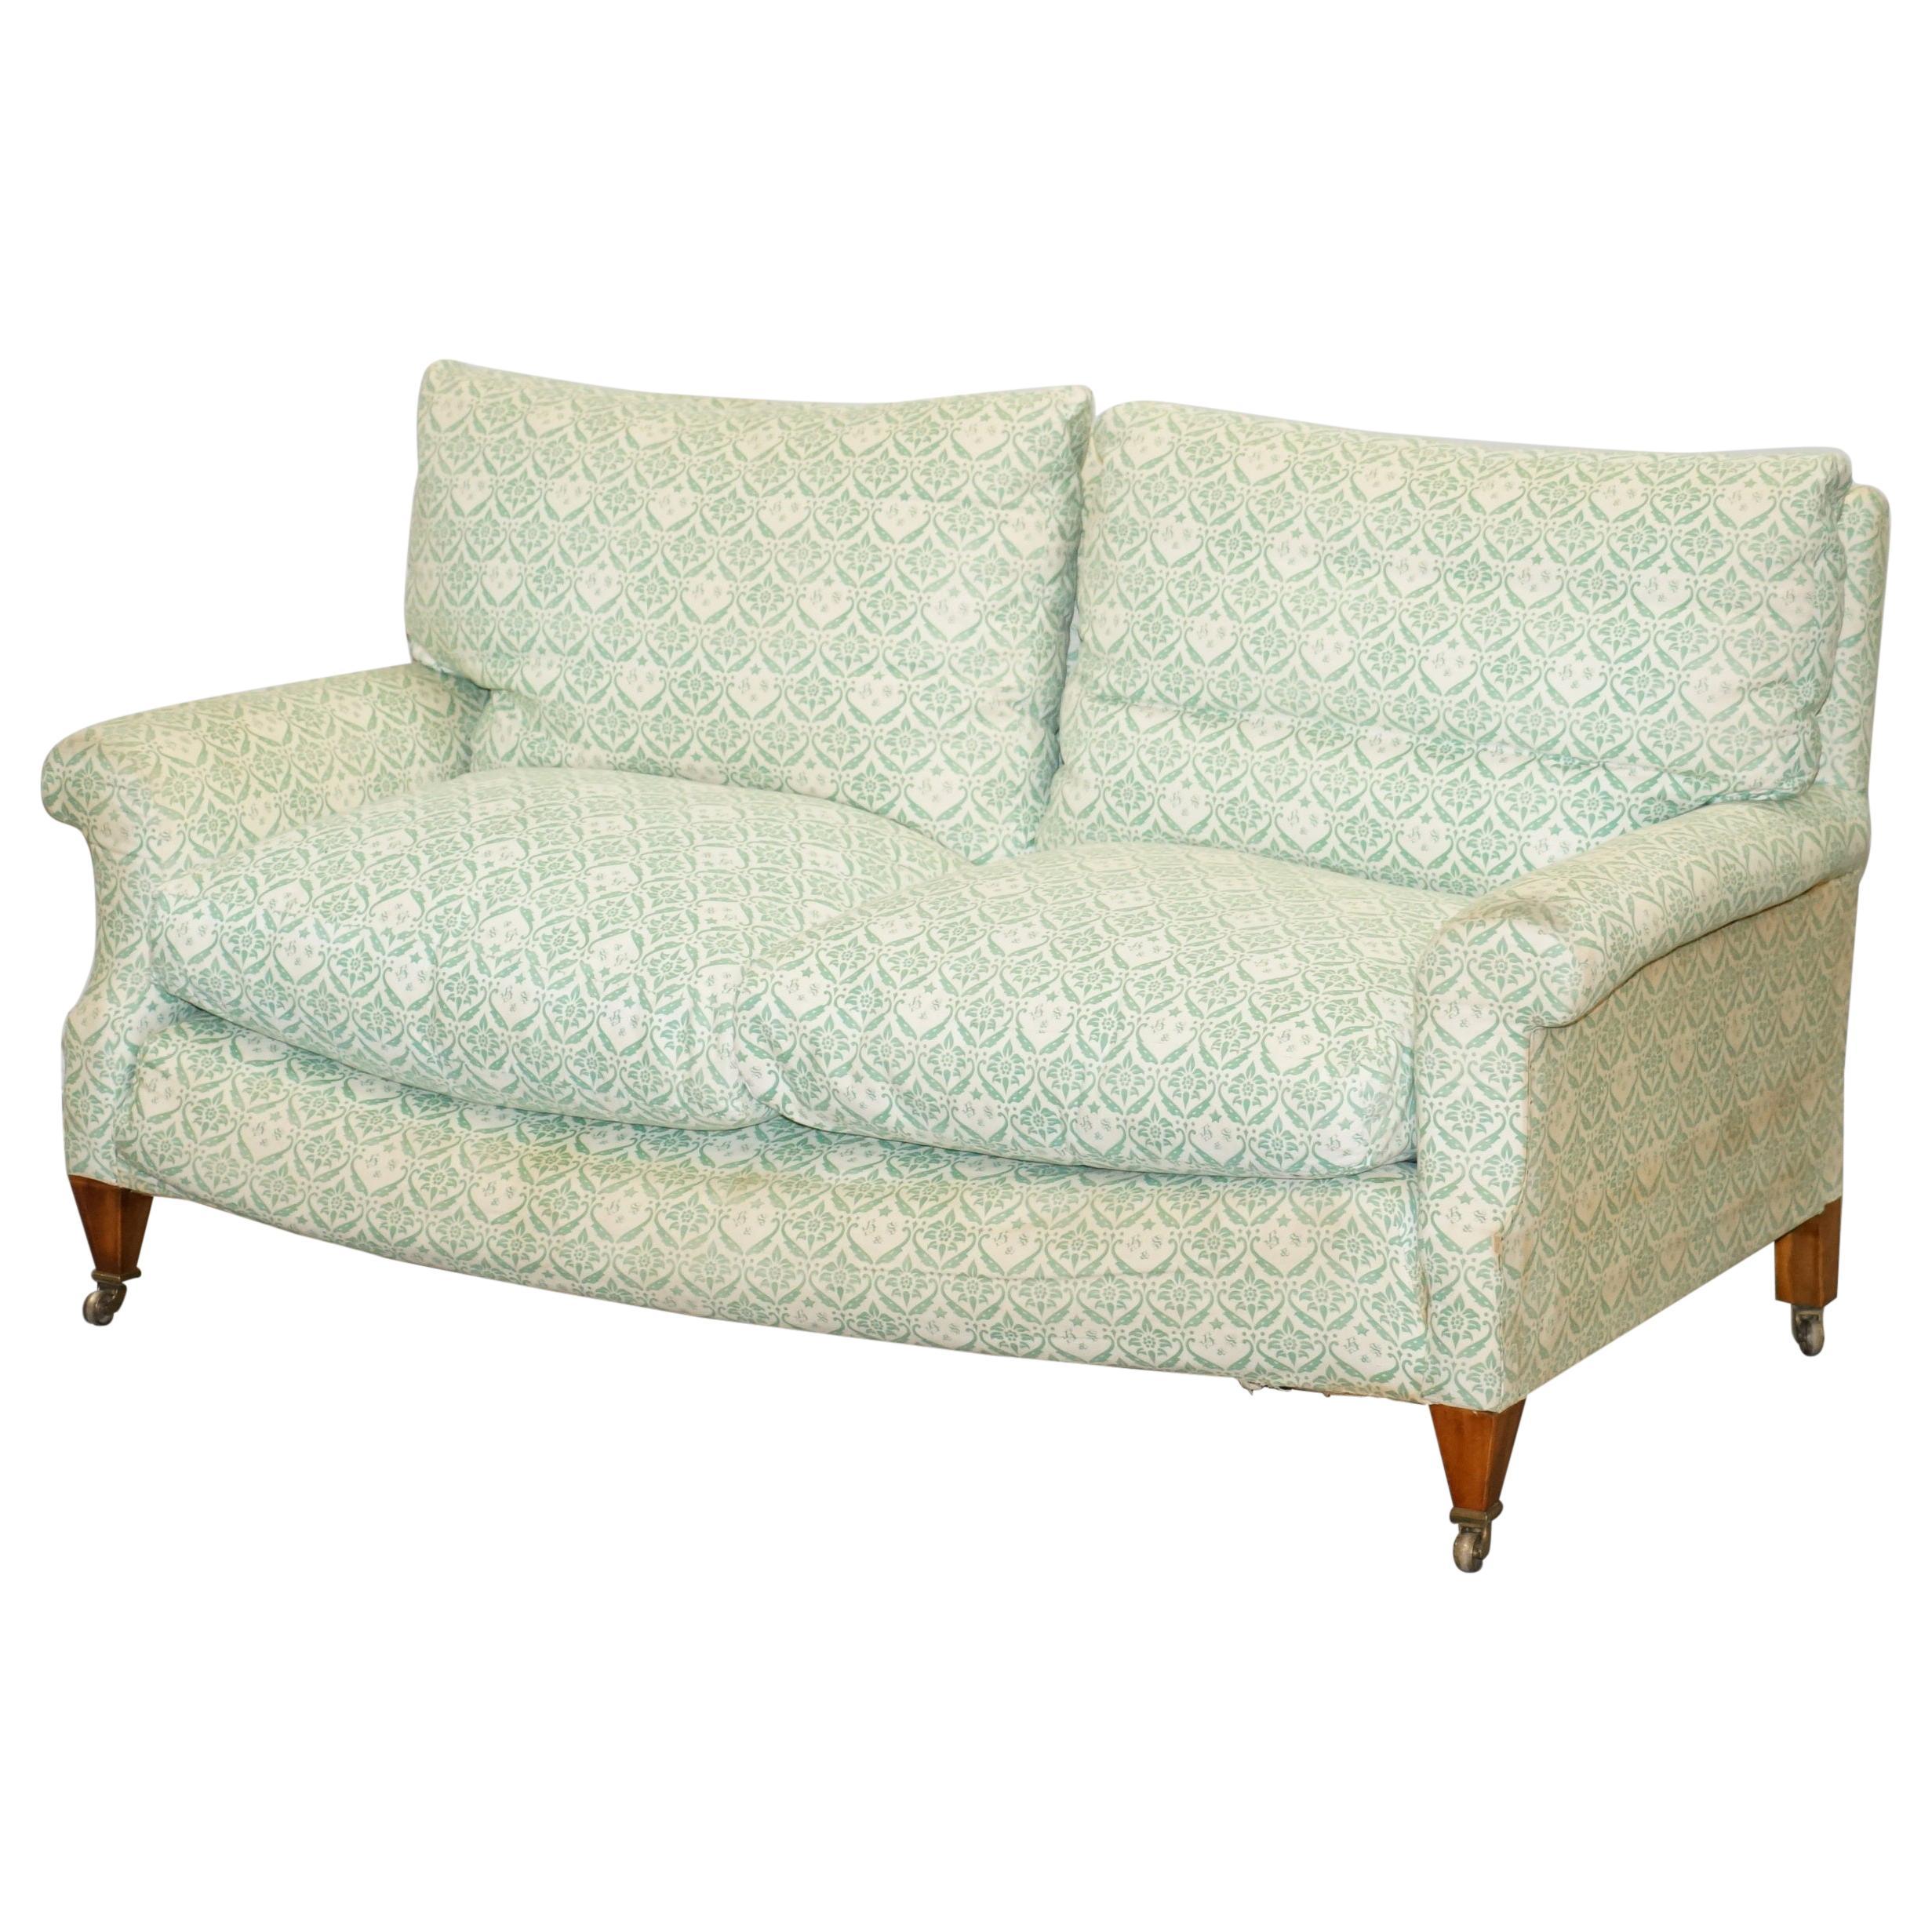 Super Comfortable circa 1920 Howard & Son's Lenygon & Morant Ticking Fabric Sofa